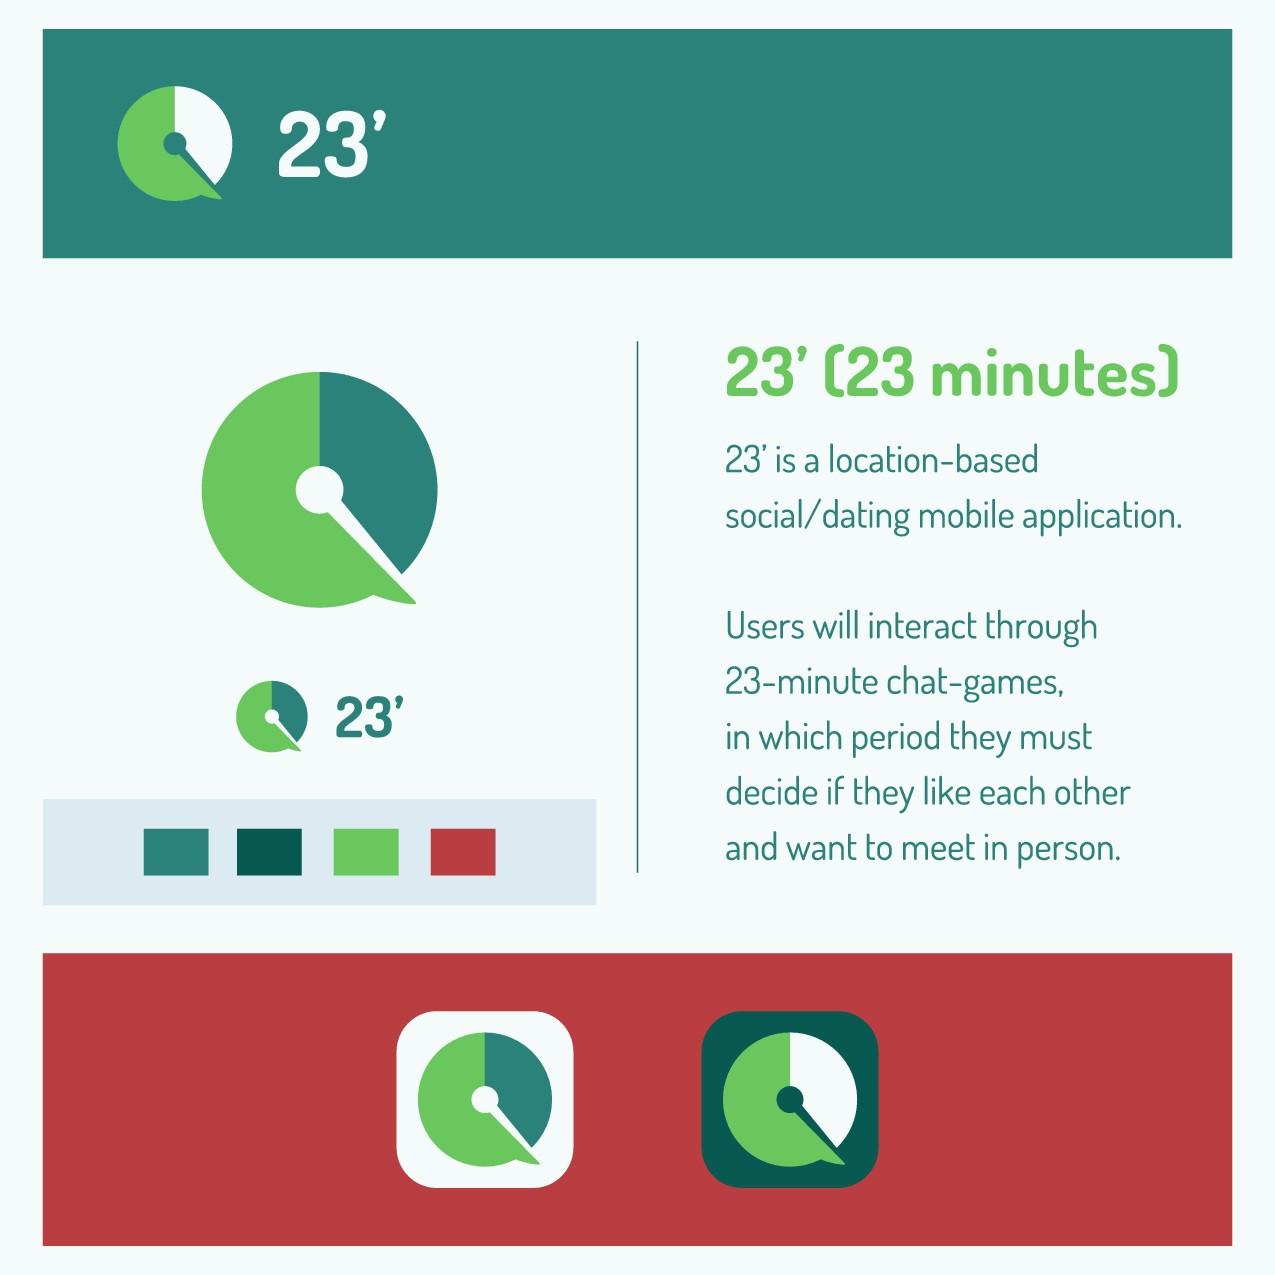 23' (23 minutes)